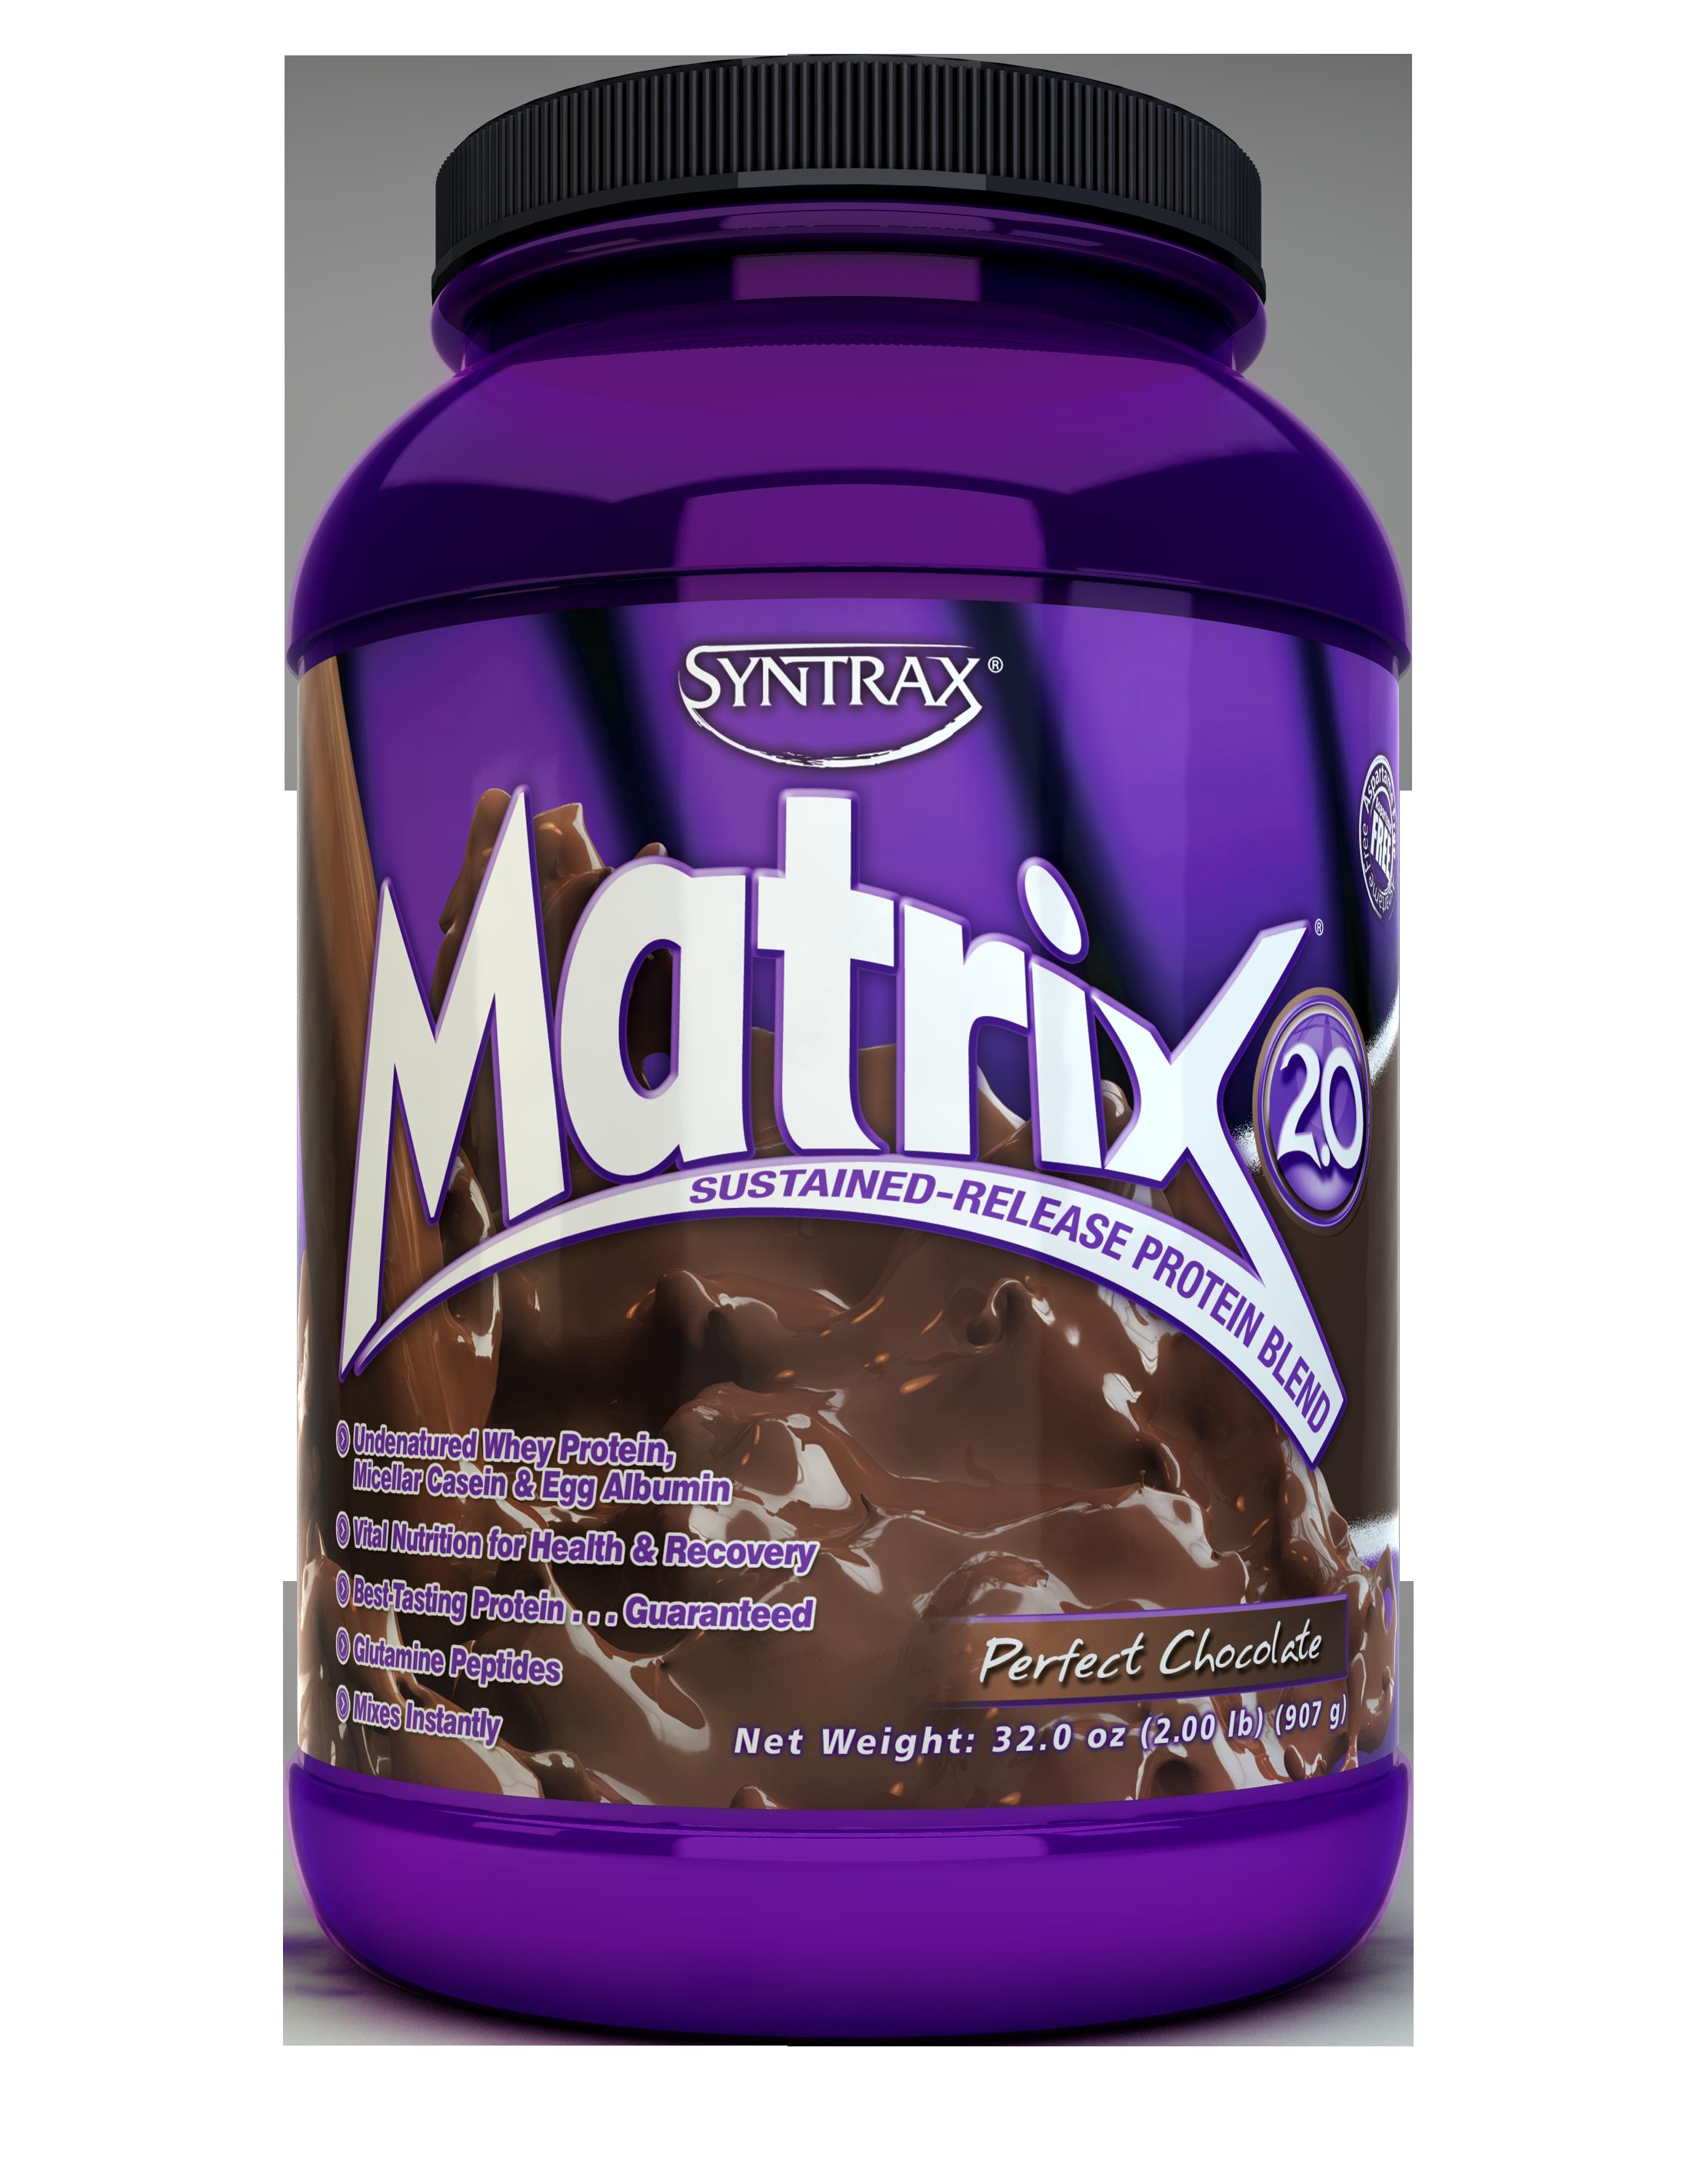 Syntrax Matrix 2.0 - Perfect Chocolate 2 lb